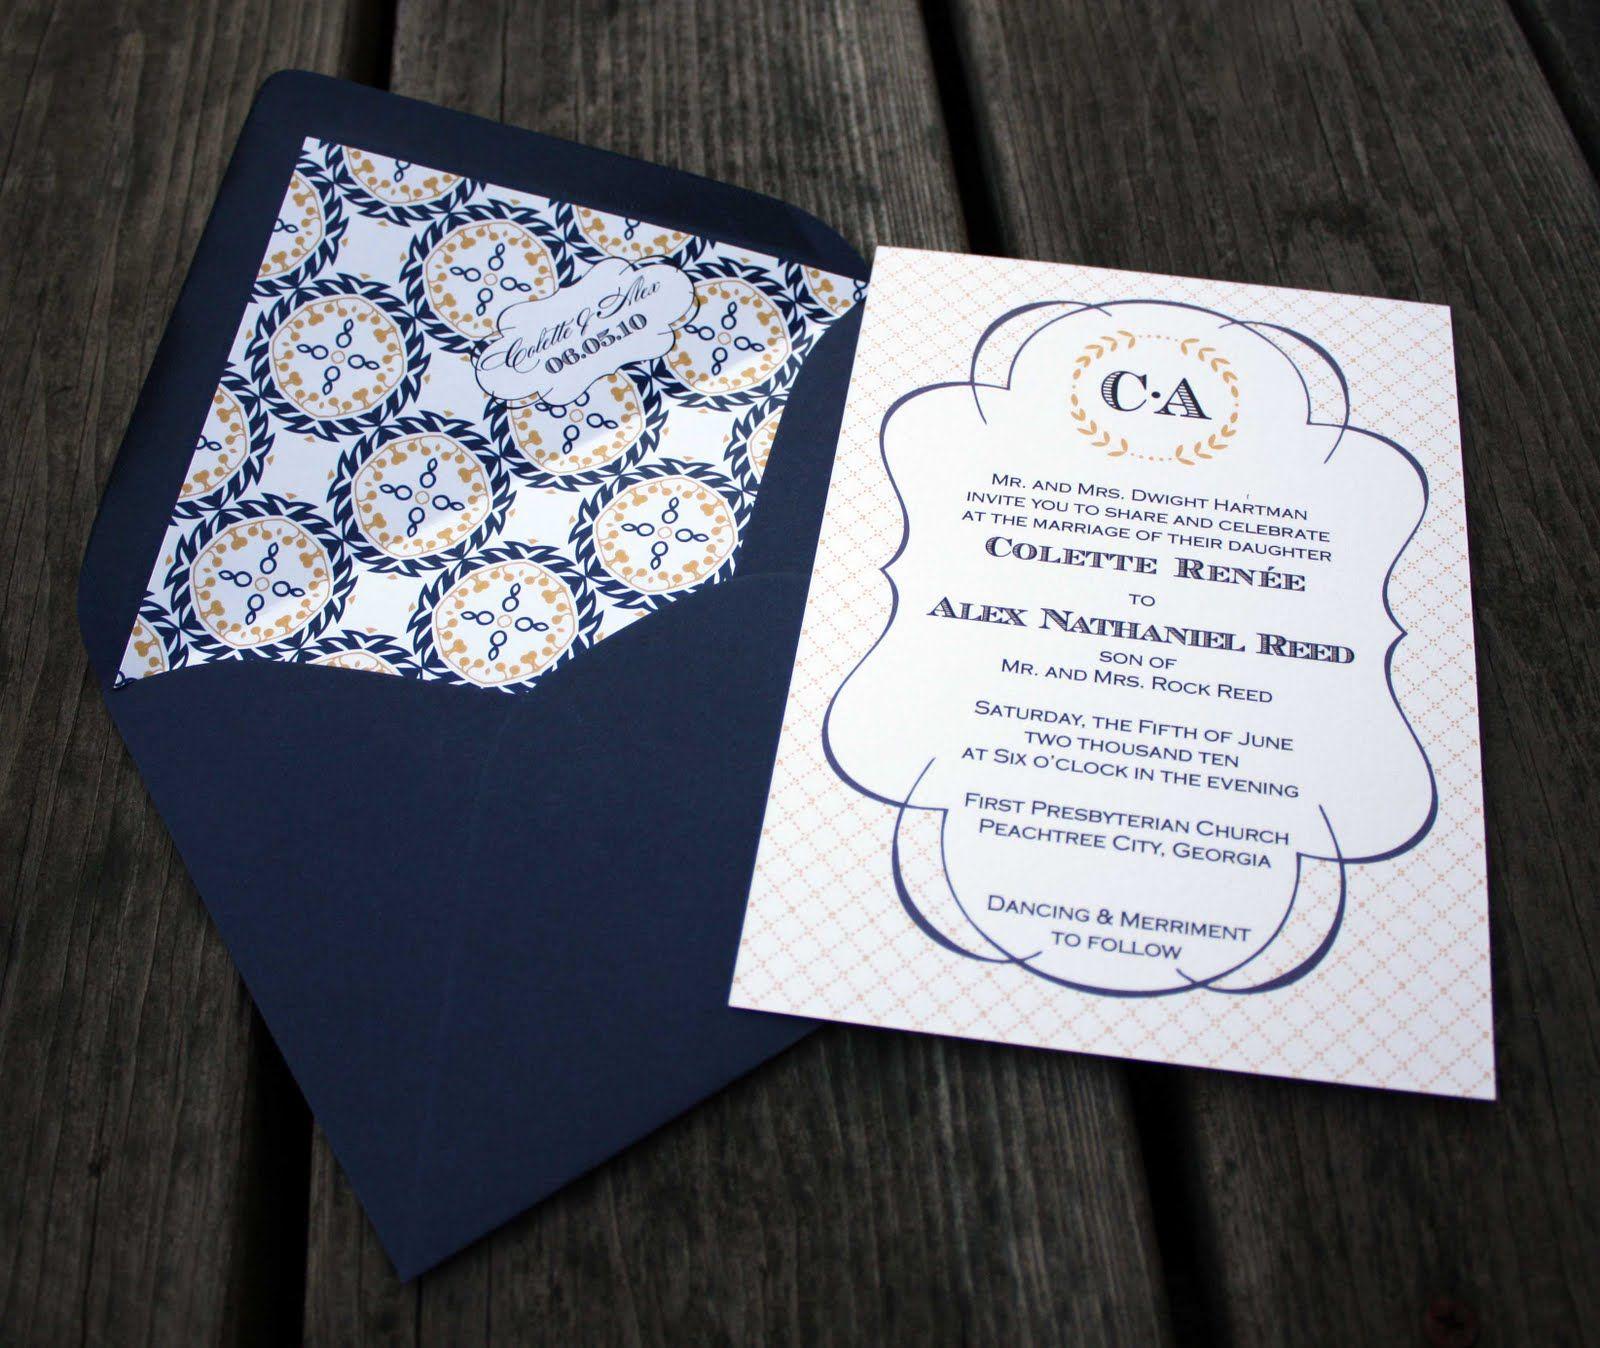 Madeline Wedding Invitations by Fourth & Folded   Rehearsal dinner ...